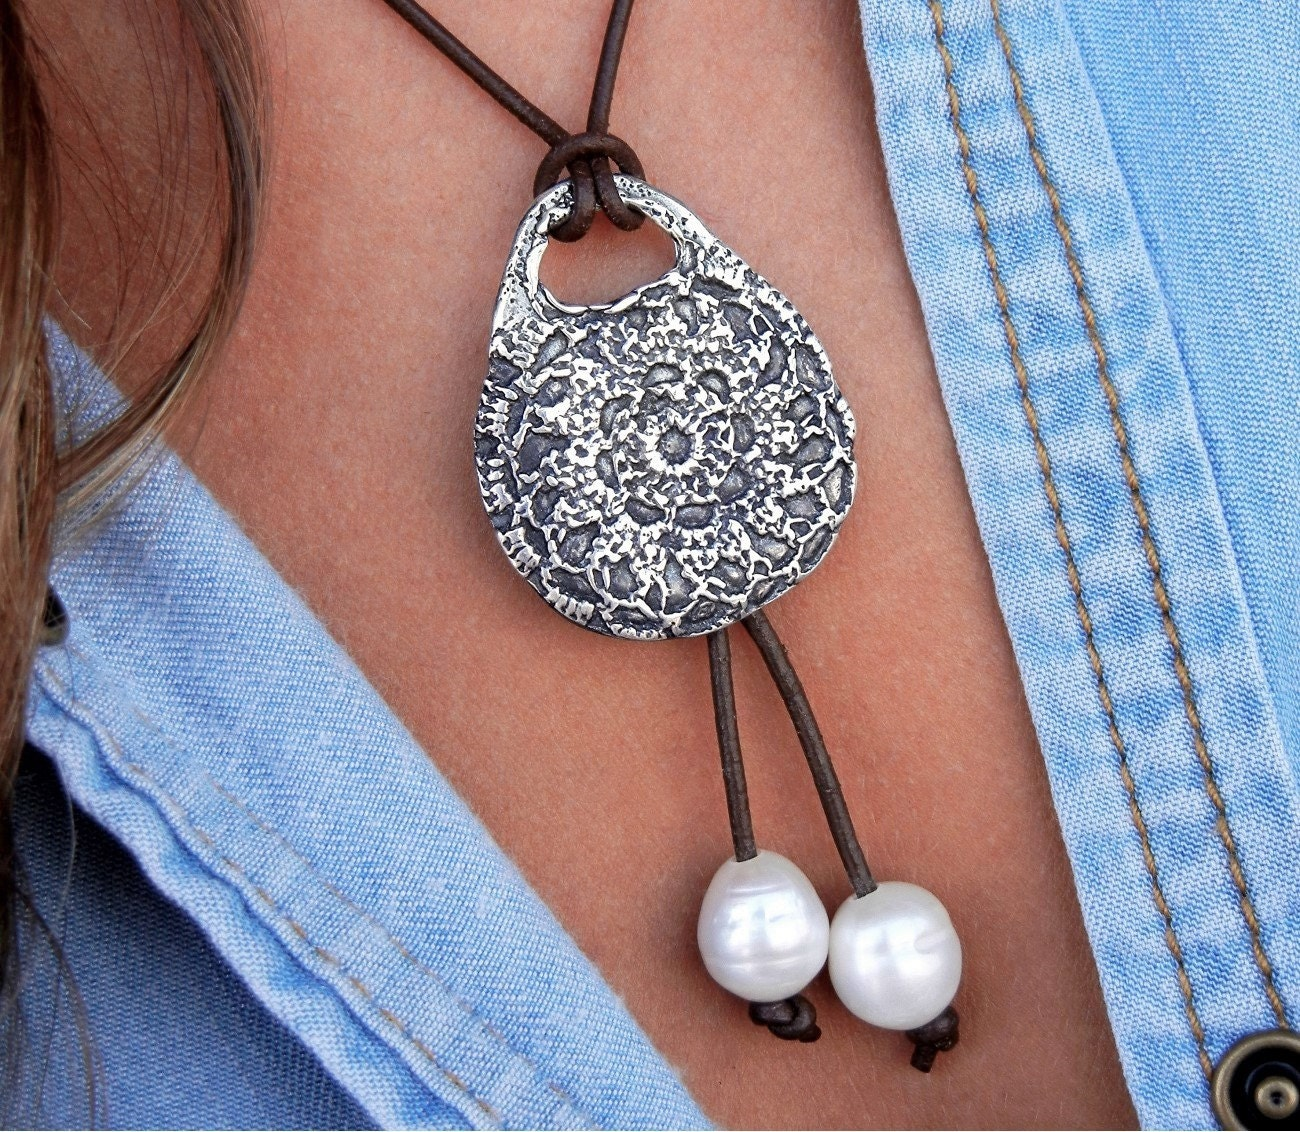 Boho Jewelry Bohemian Necklace Boho Chic Necklace Bohemian